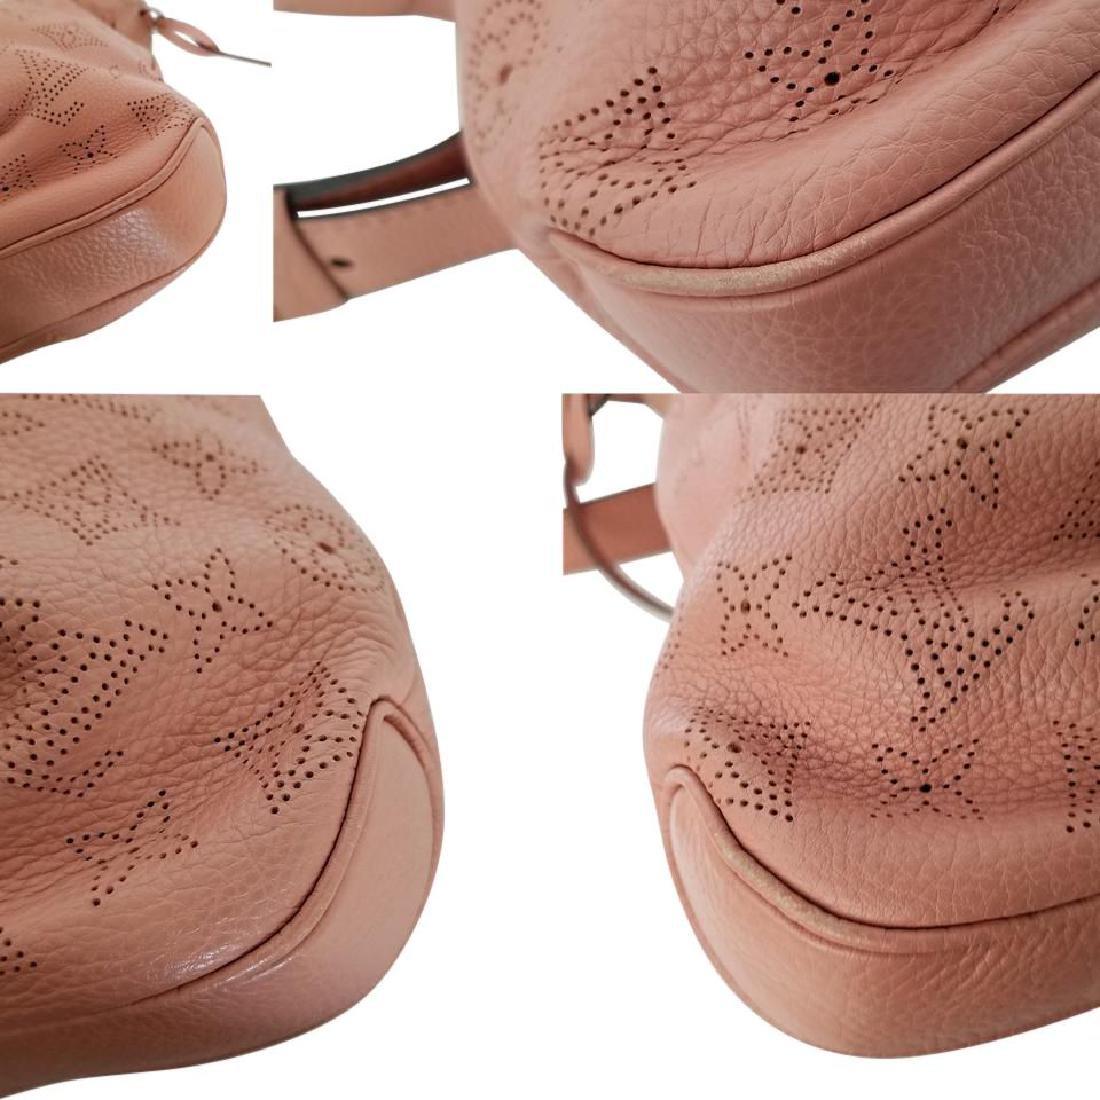 Louis Vuitton Selene Mahina Handbag Pm Pink Salmon - 9